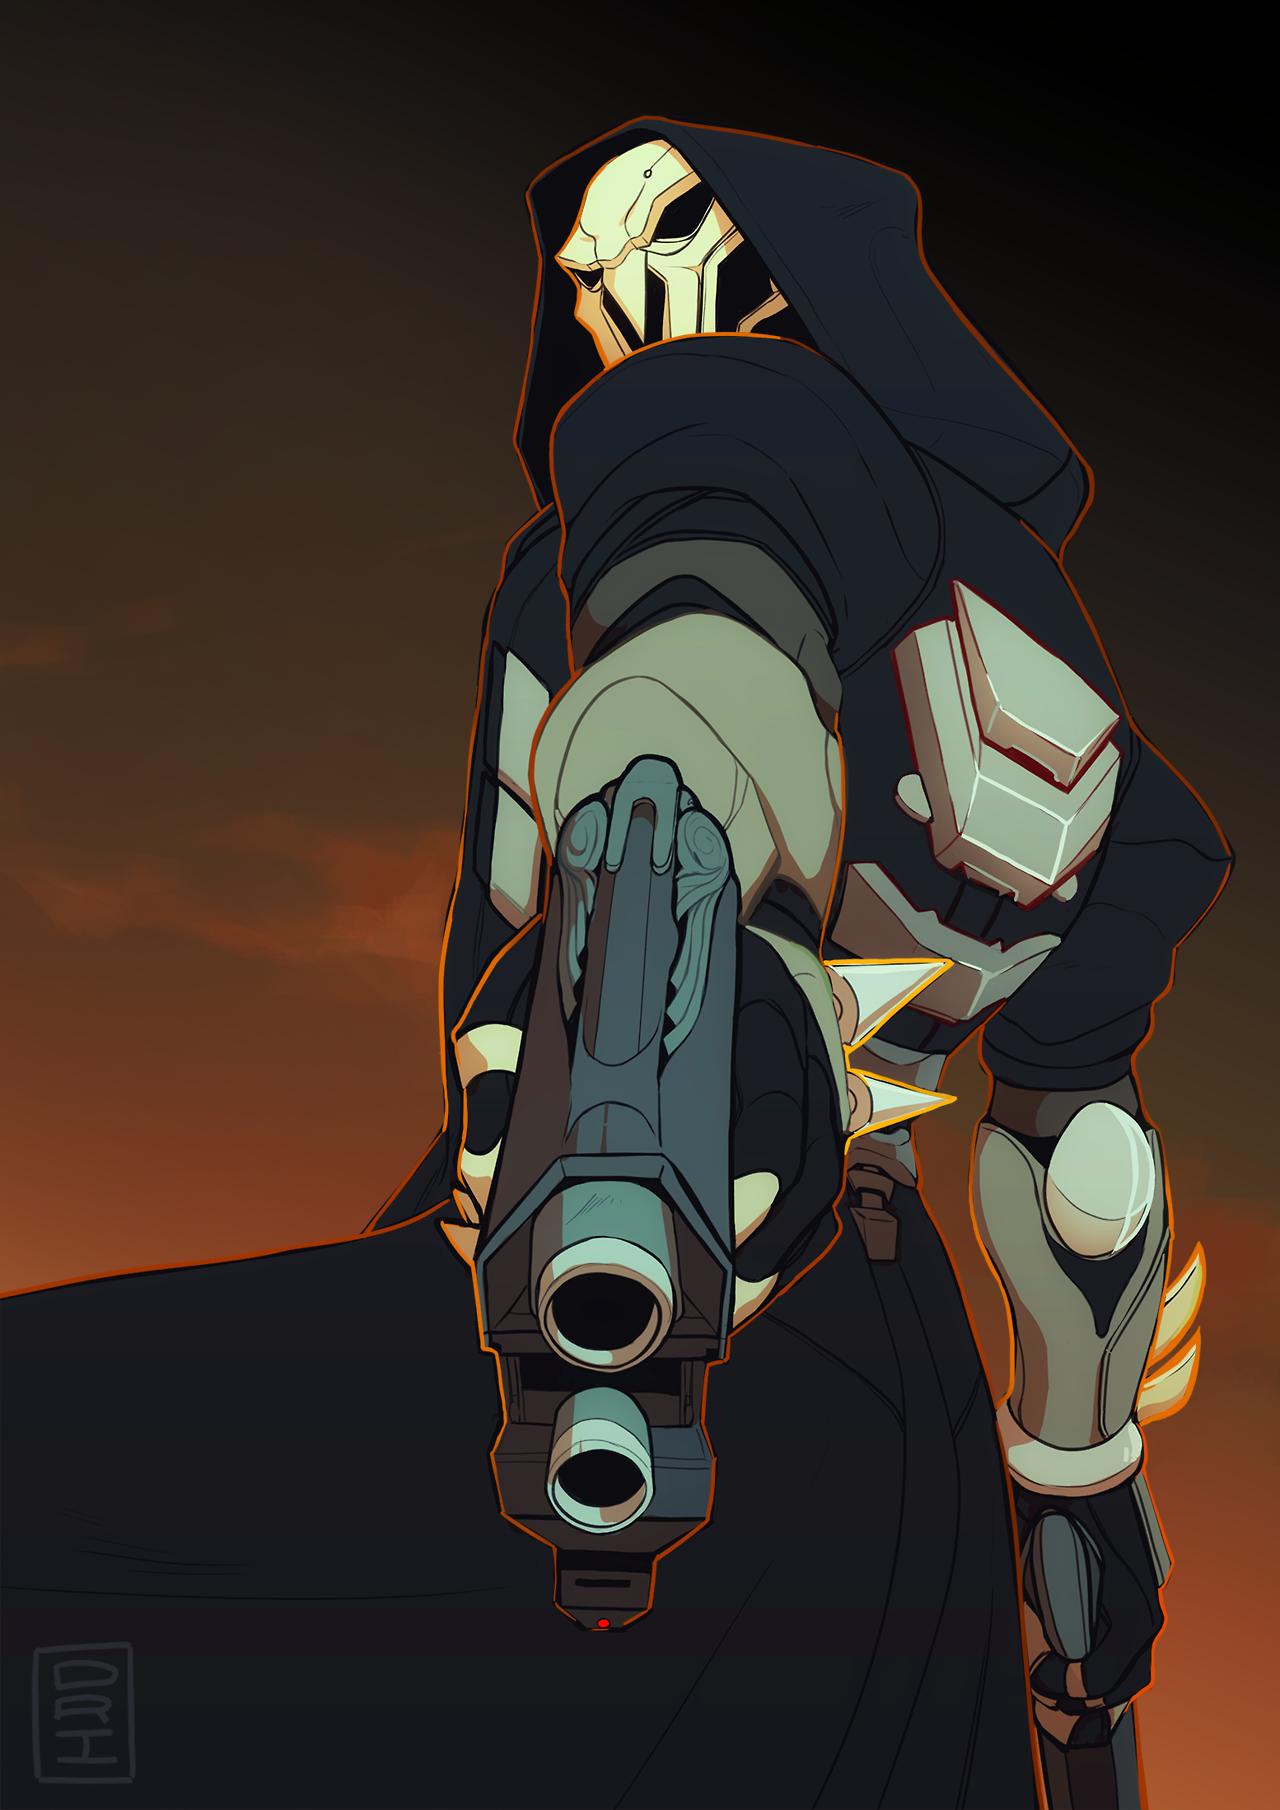 Tumblr Osabof3pim1rvzrpxo1 1280 Png 1280 1810 Overwatch Reaper Gabriel Reyes Overwatch Overwatch Posters